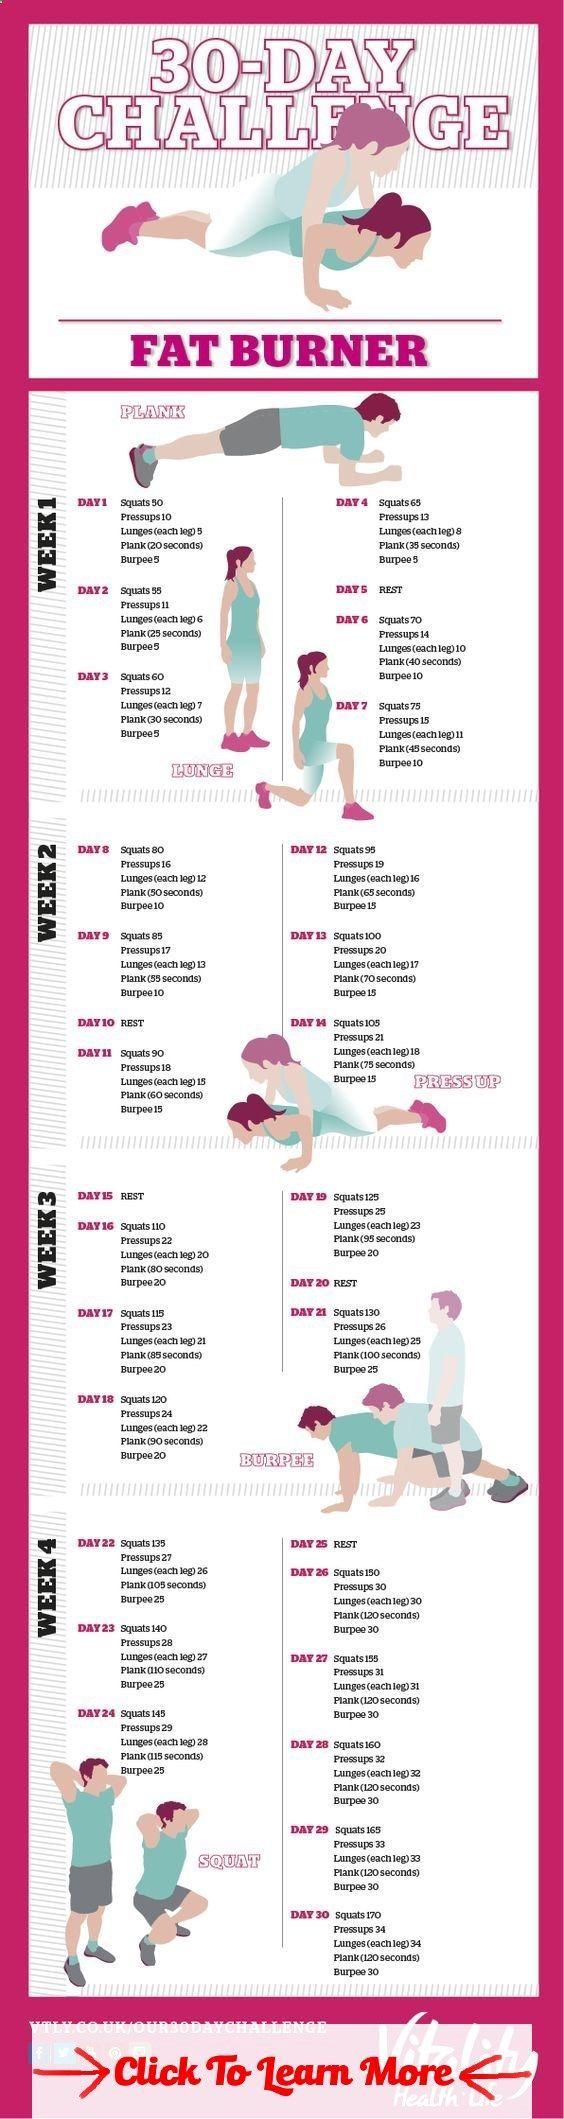 30 Day Fat Burning Challenge #health #fitness #weightloss #healthyrecipes #weightlossrecipes